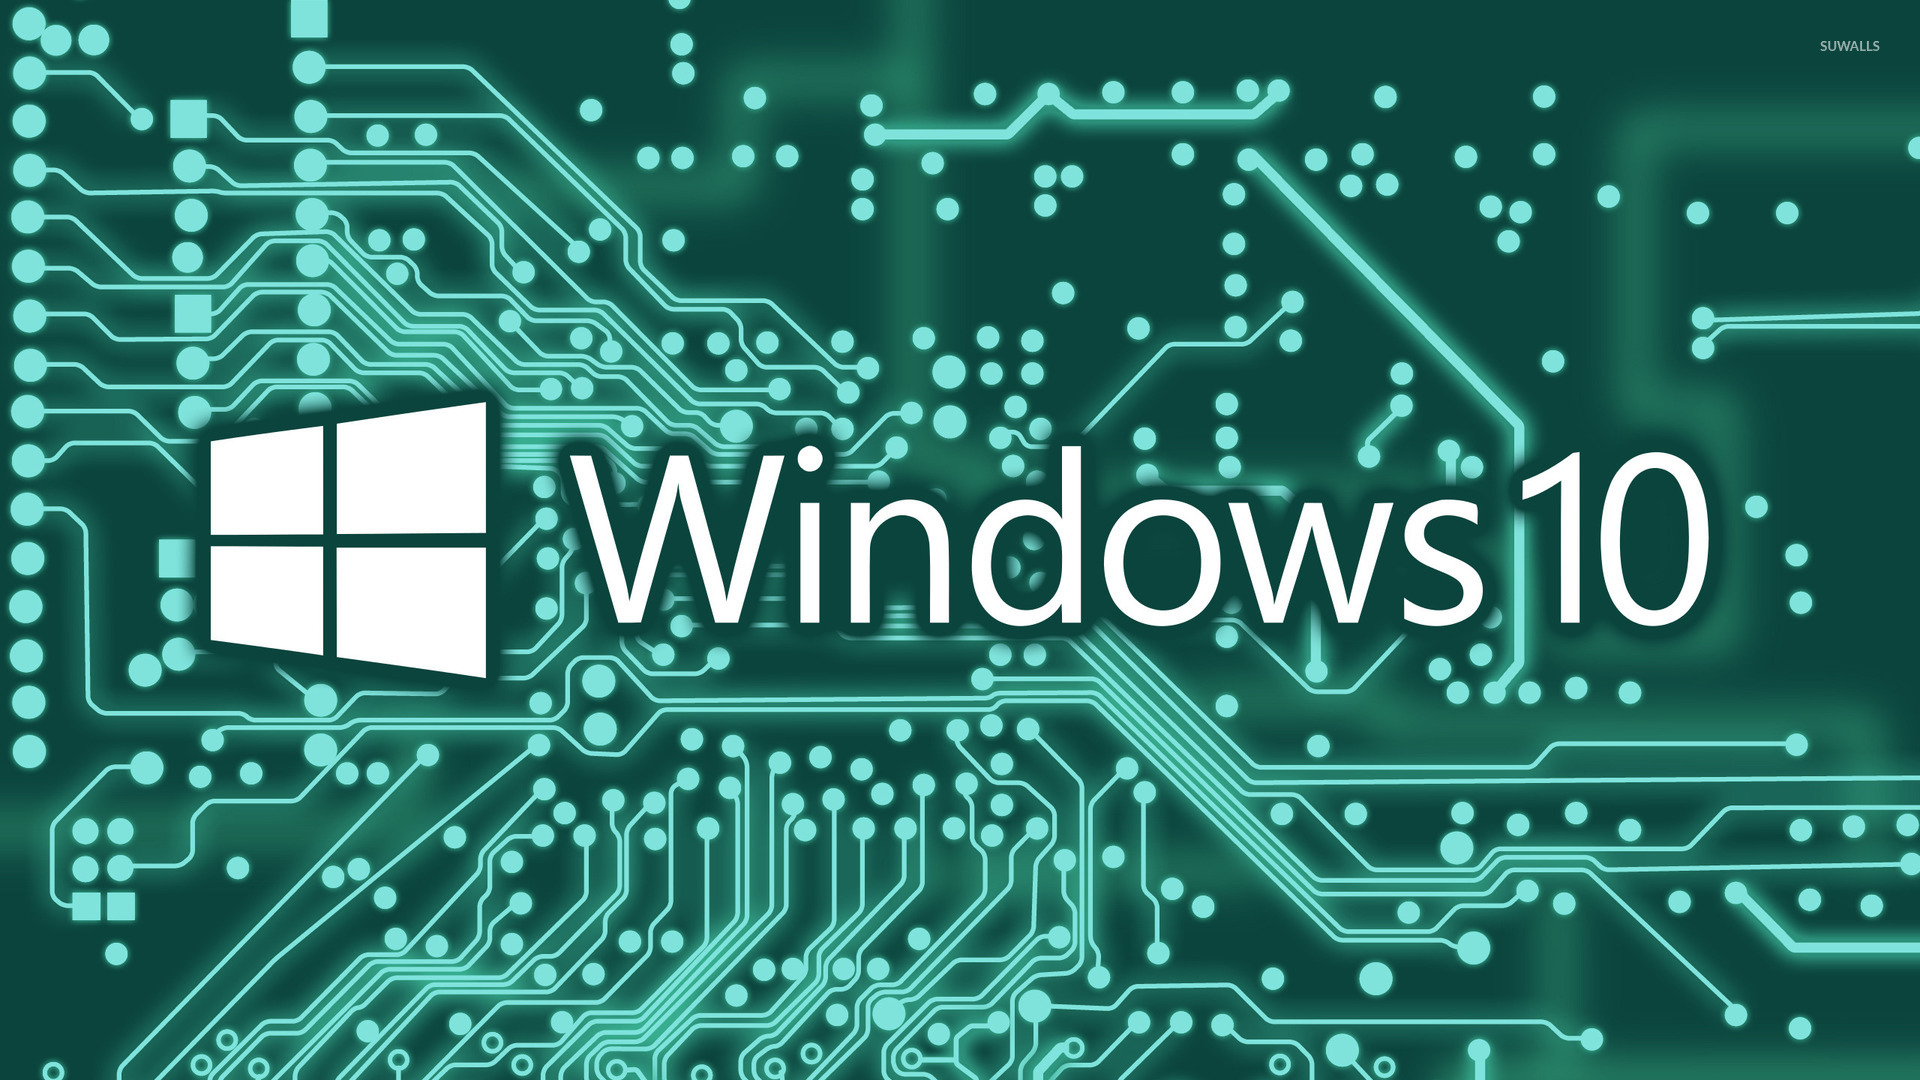 windows 10 white text logo on a circuit board wallpaper